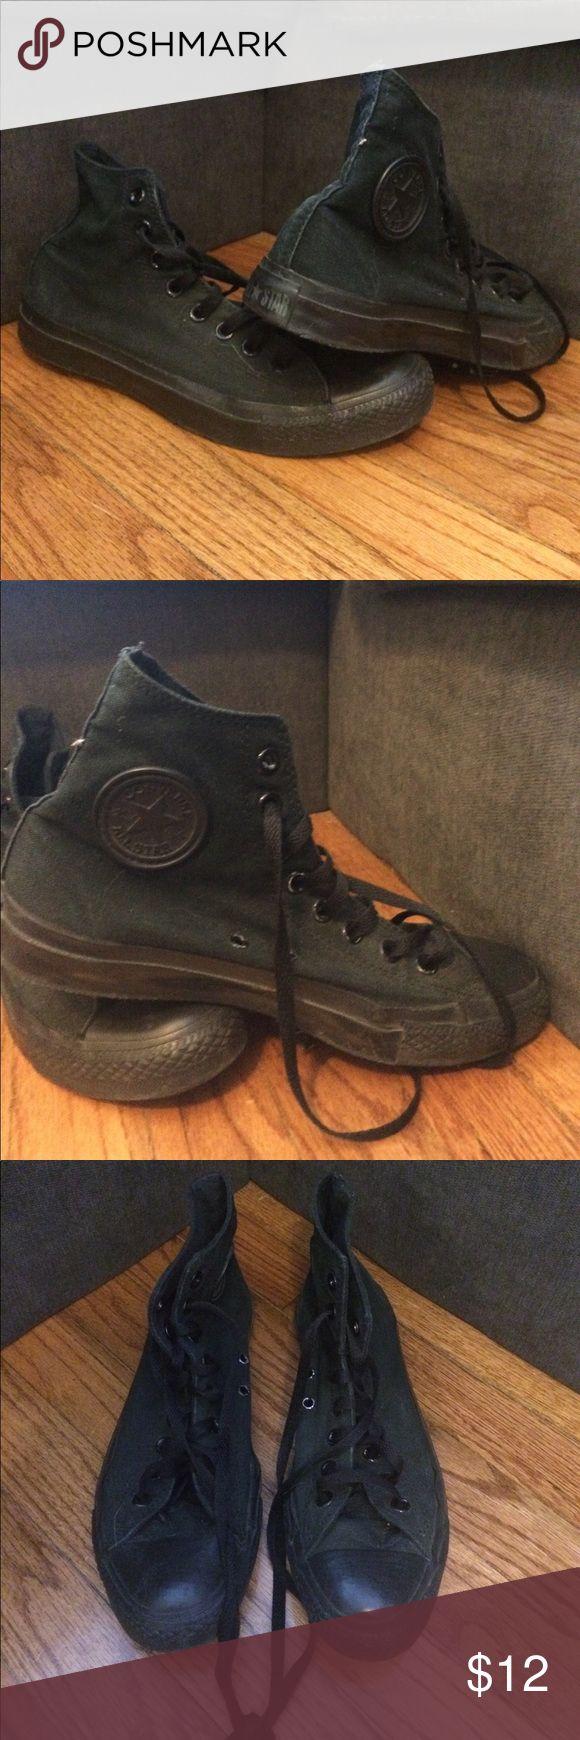 Men's black Chuck Taylors Men's black canvas Chuck Taylors high tops. Regular wear with lots of life left. Size 7 1/2 Converse Shoes